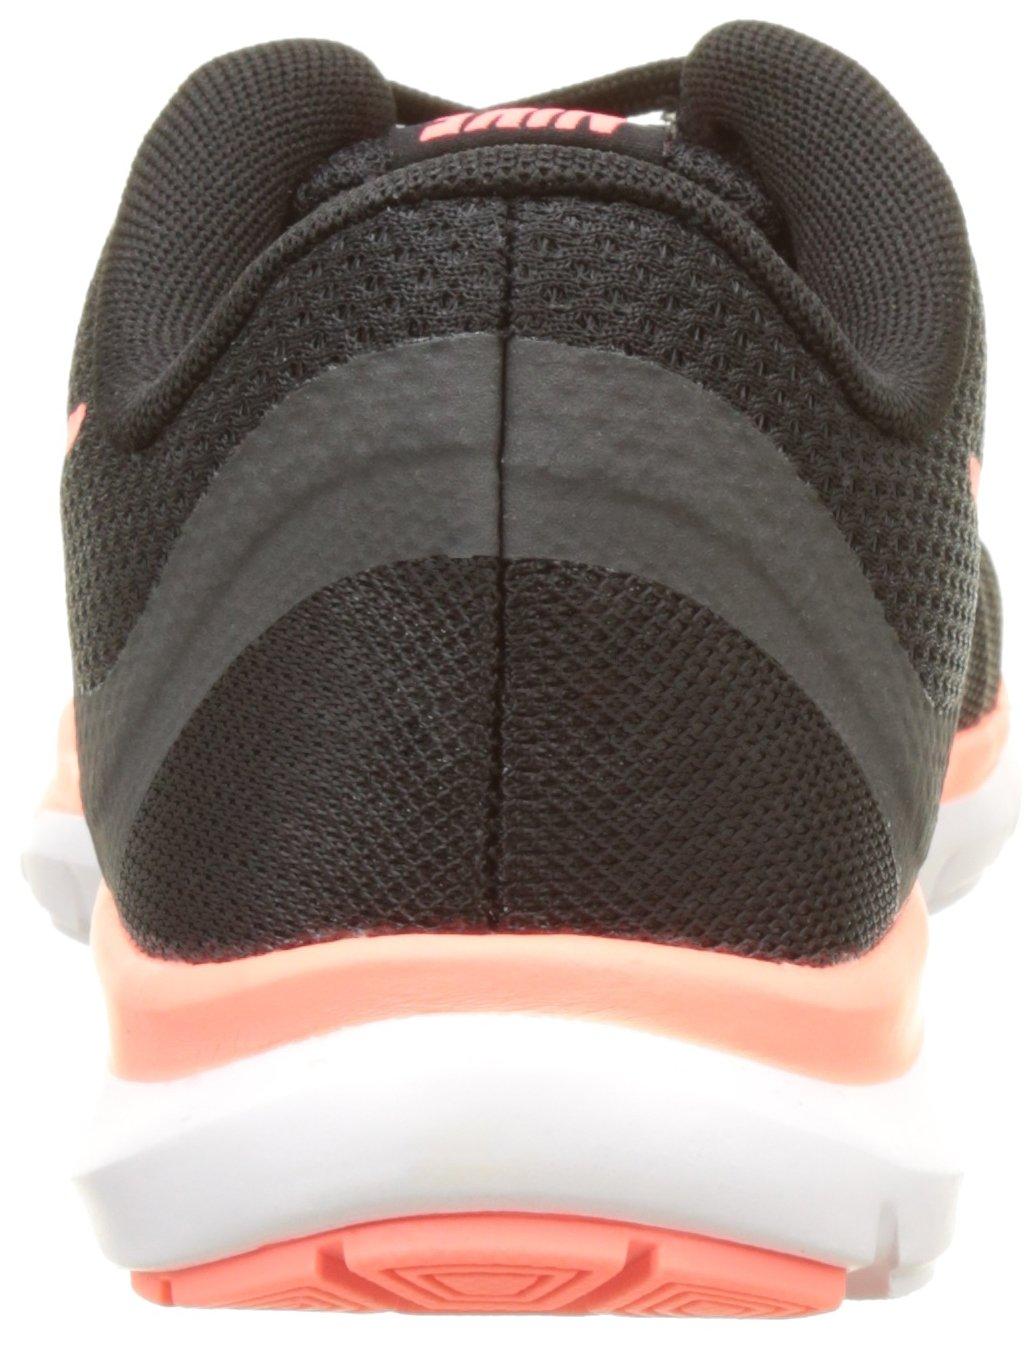 NIKE Women's Flex Trainer 6 B01FSGHASK 9.5 Anthracite B(M) US|Black Lava Glow Anthracite 9.5 f6f3d2